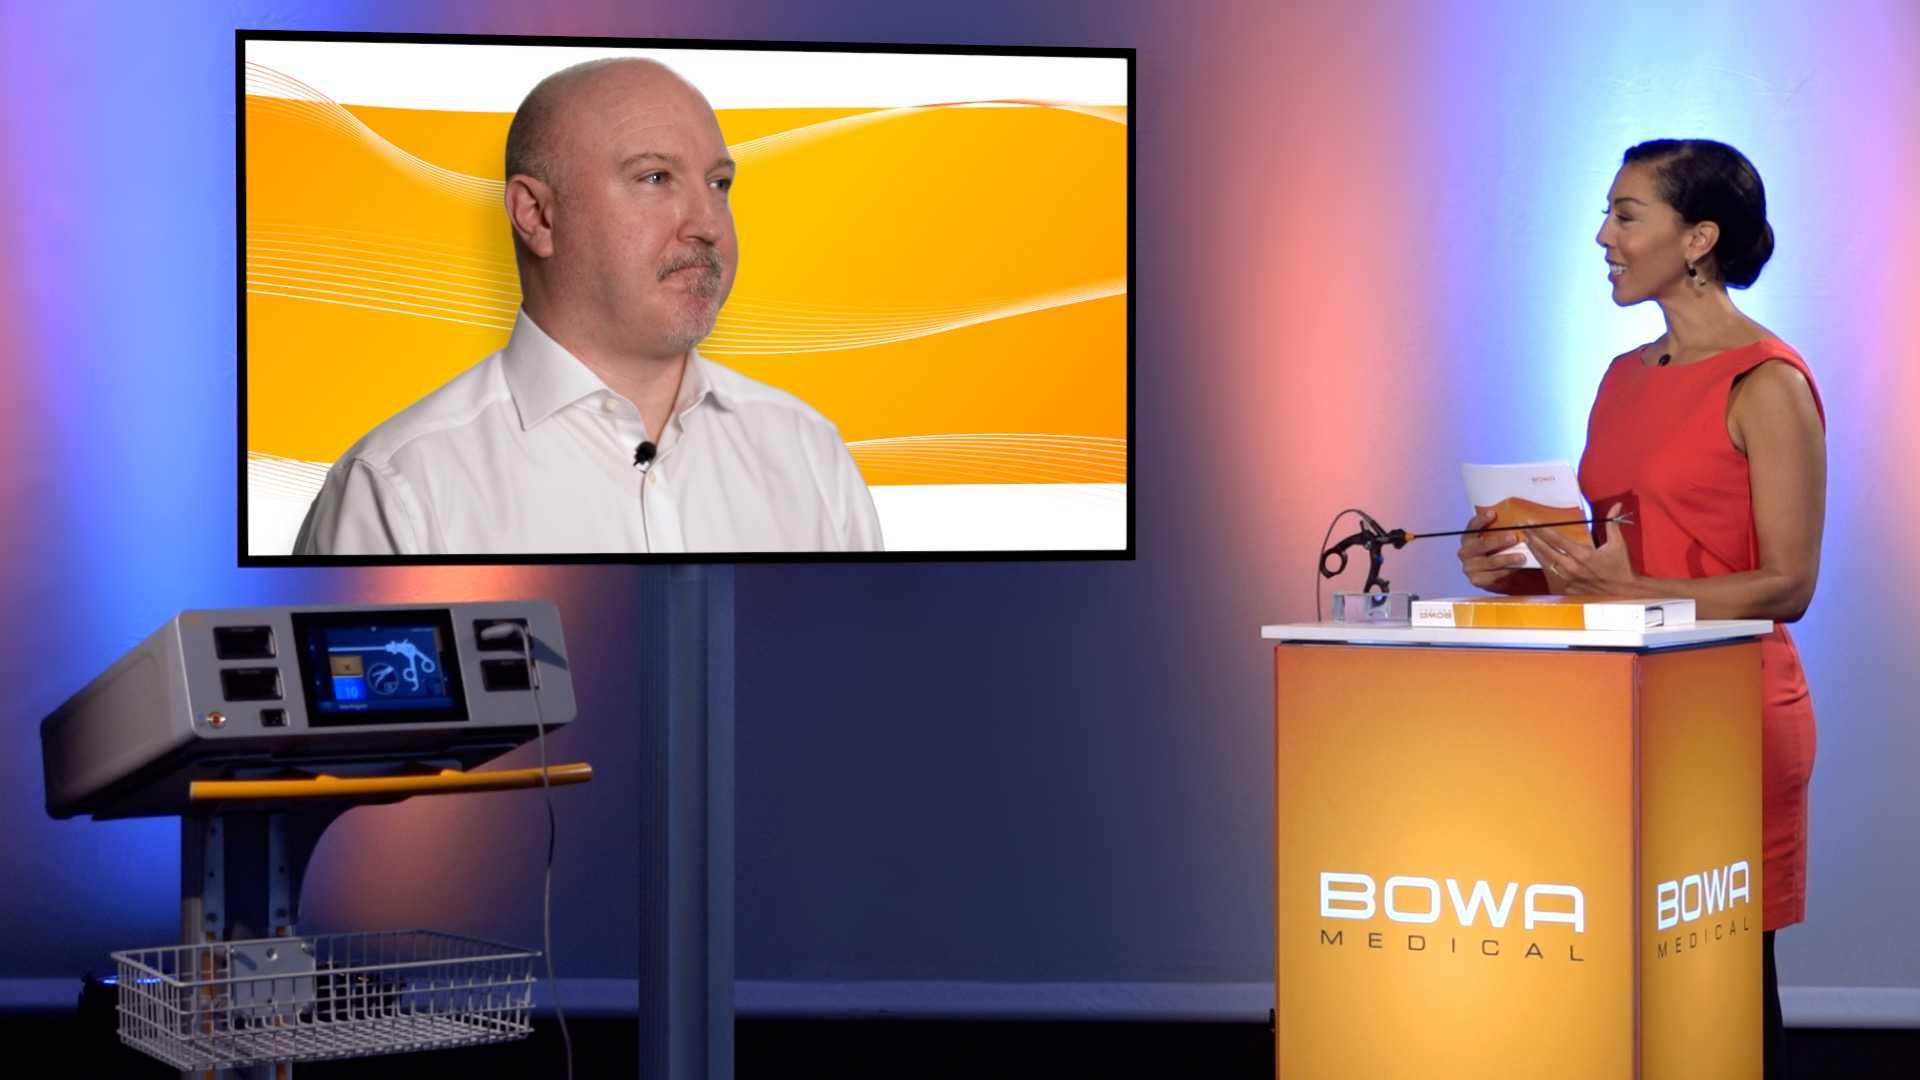 CEO Bowa